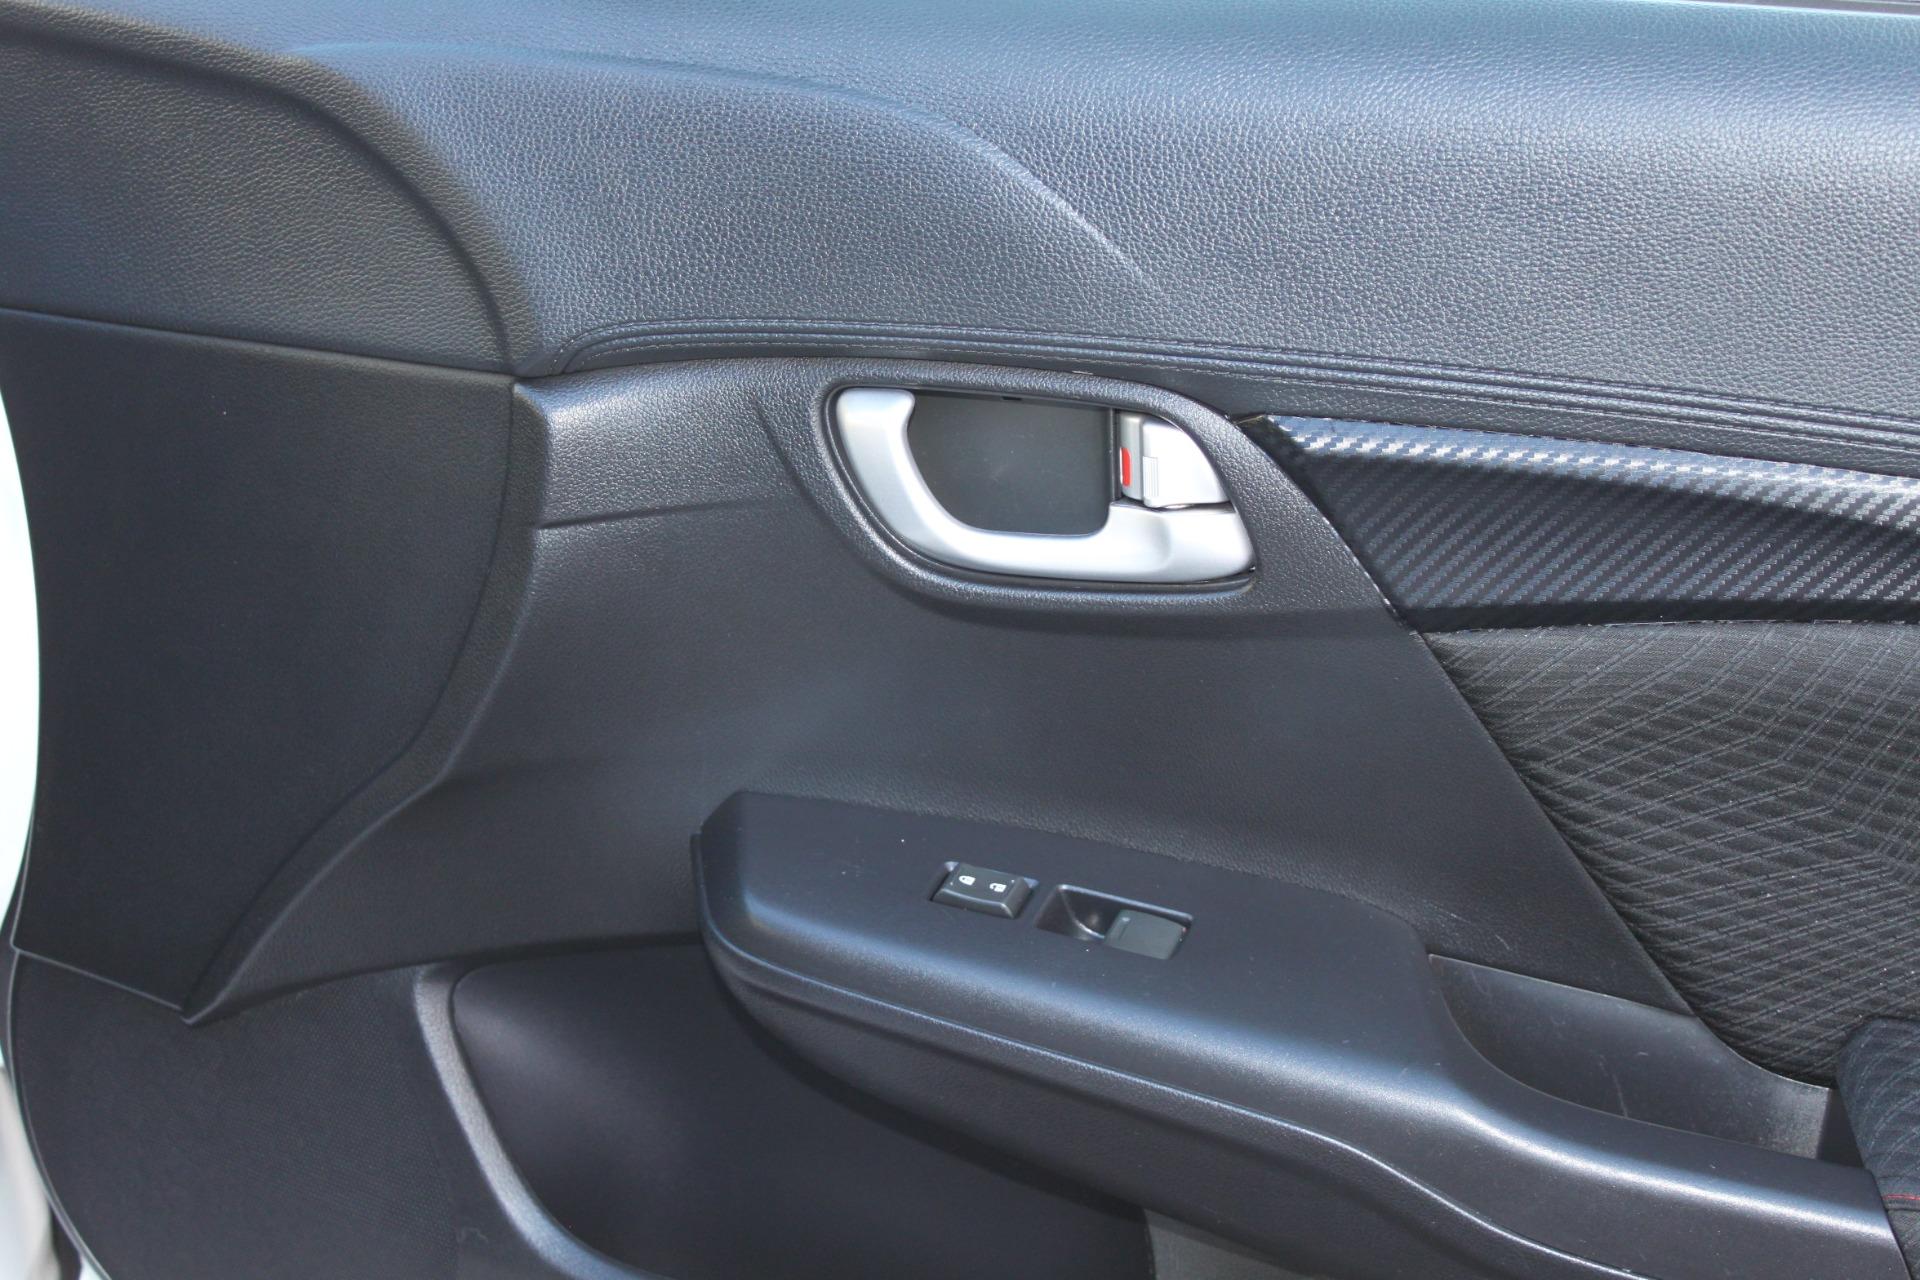 Used-2013-Honda-Civic-Sedan-Si-Wrangler